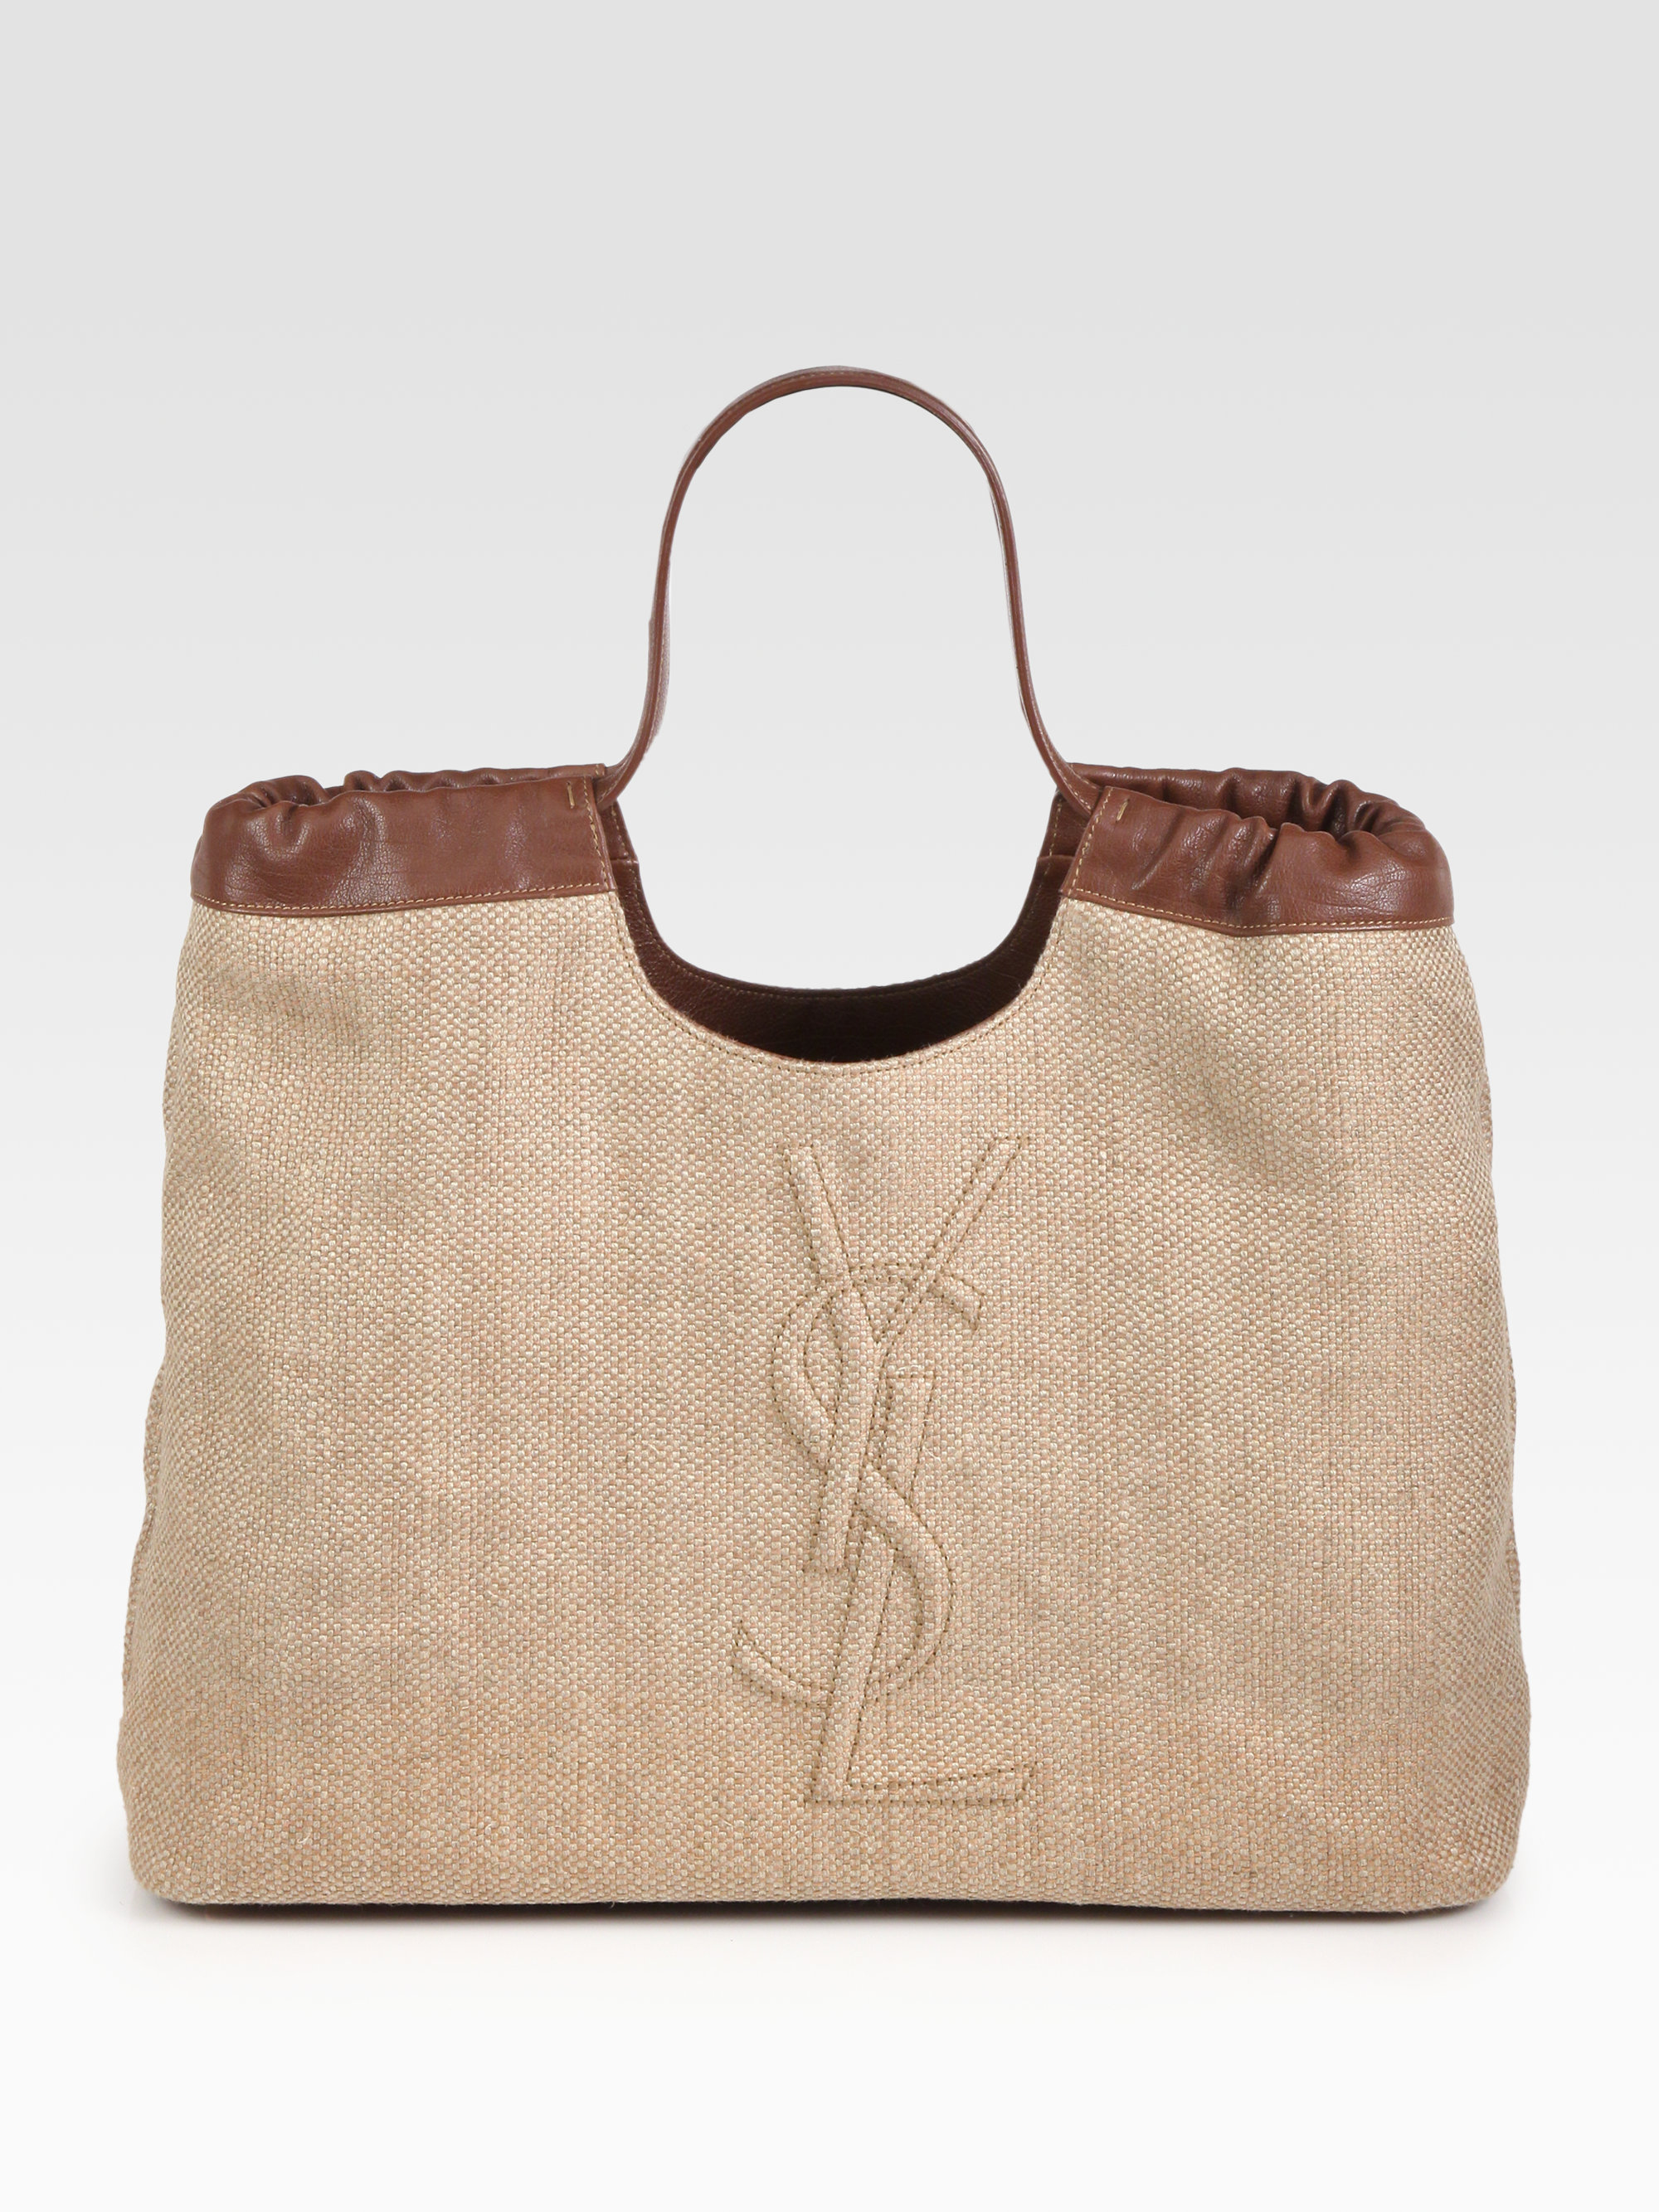 ysl duffle bag - yves saint laurent large calfskin fringe shopping tote bag, yve ...